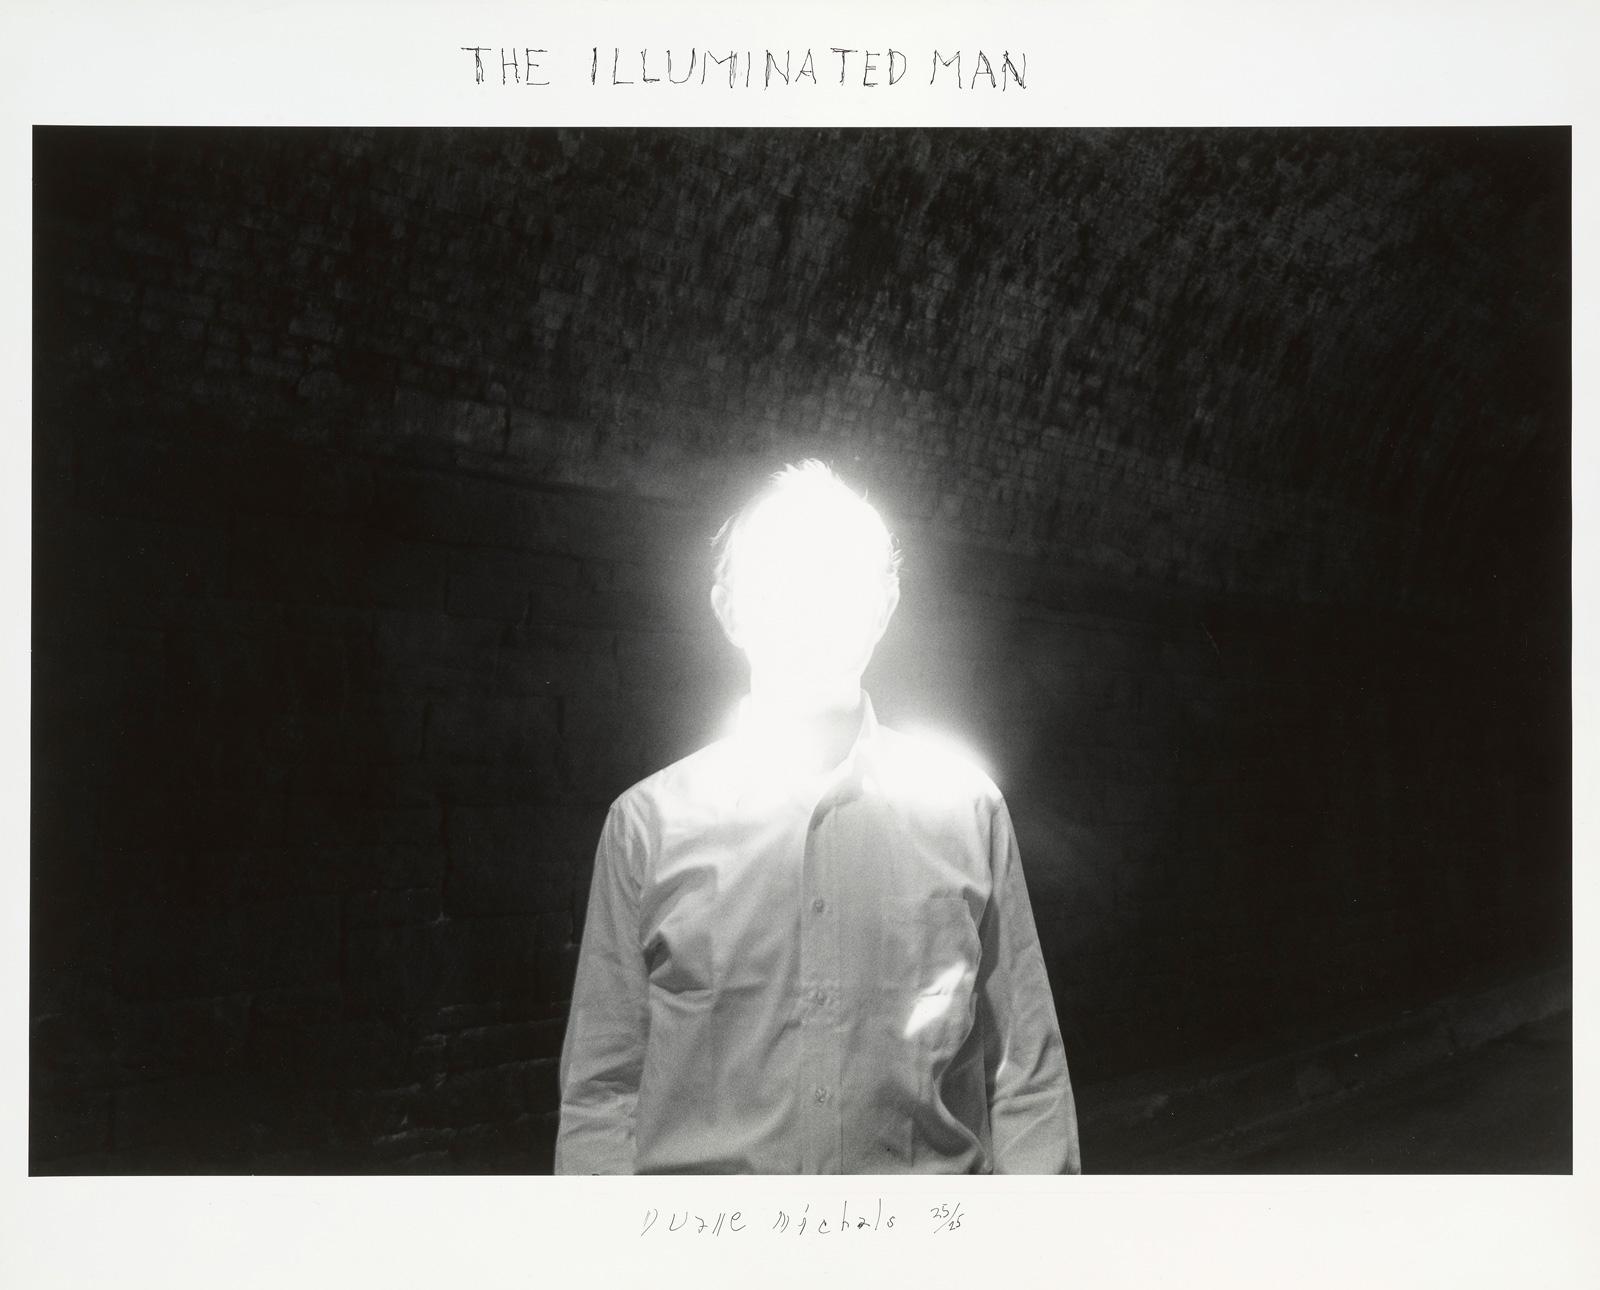 Duane Michals: The Illuminated Man, 1968